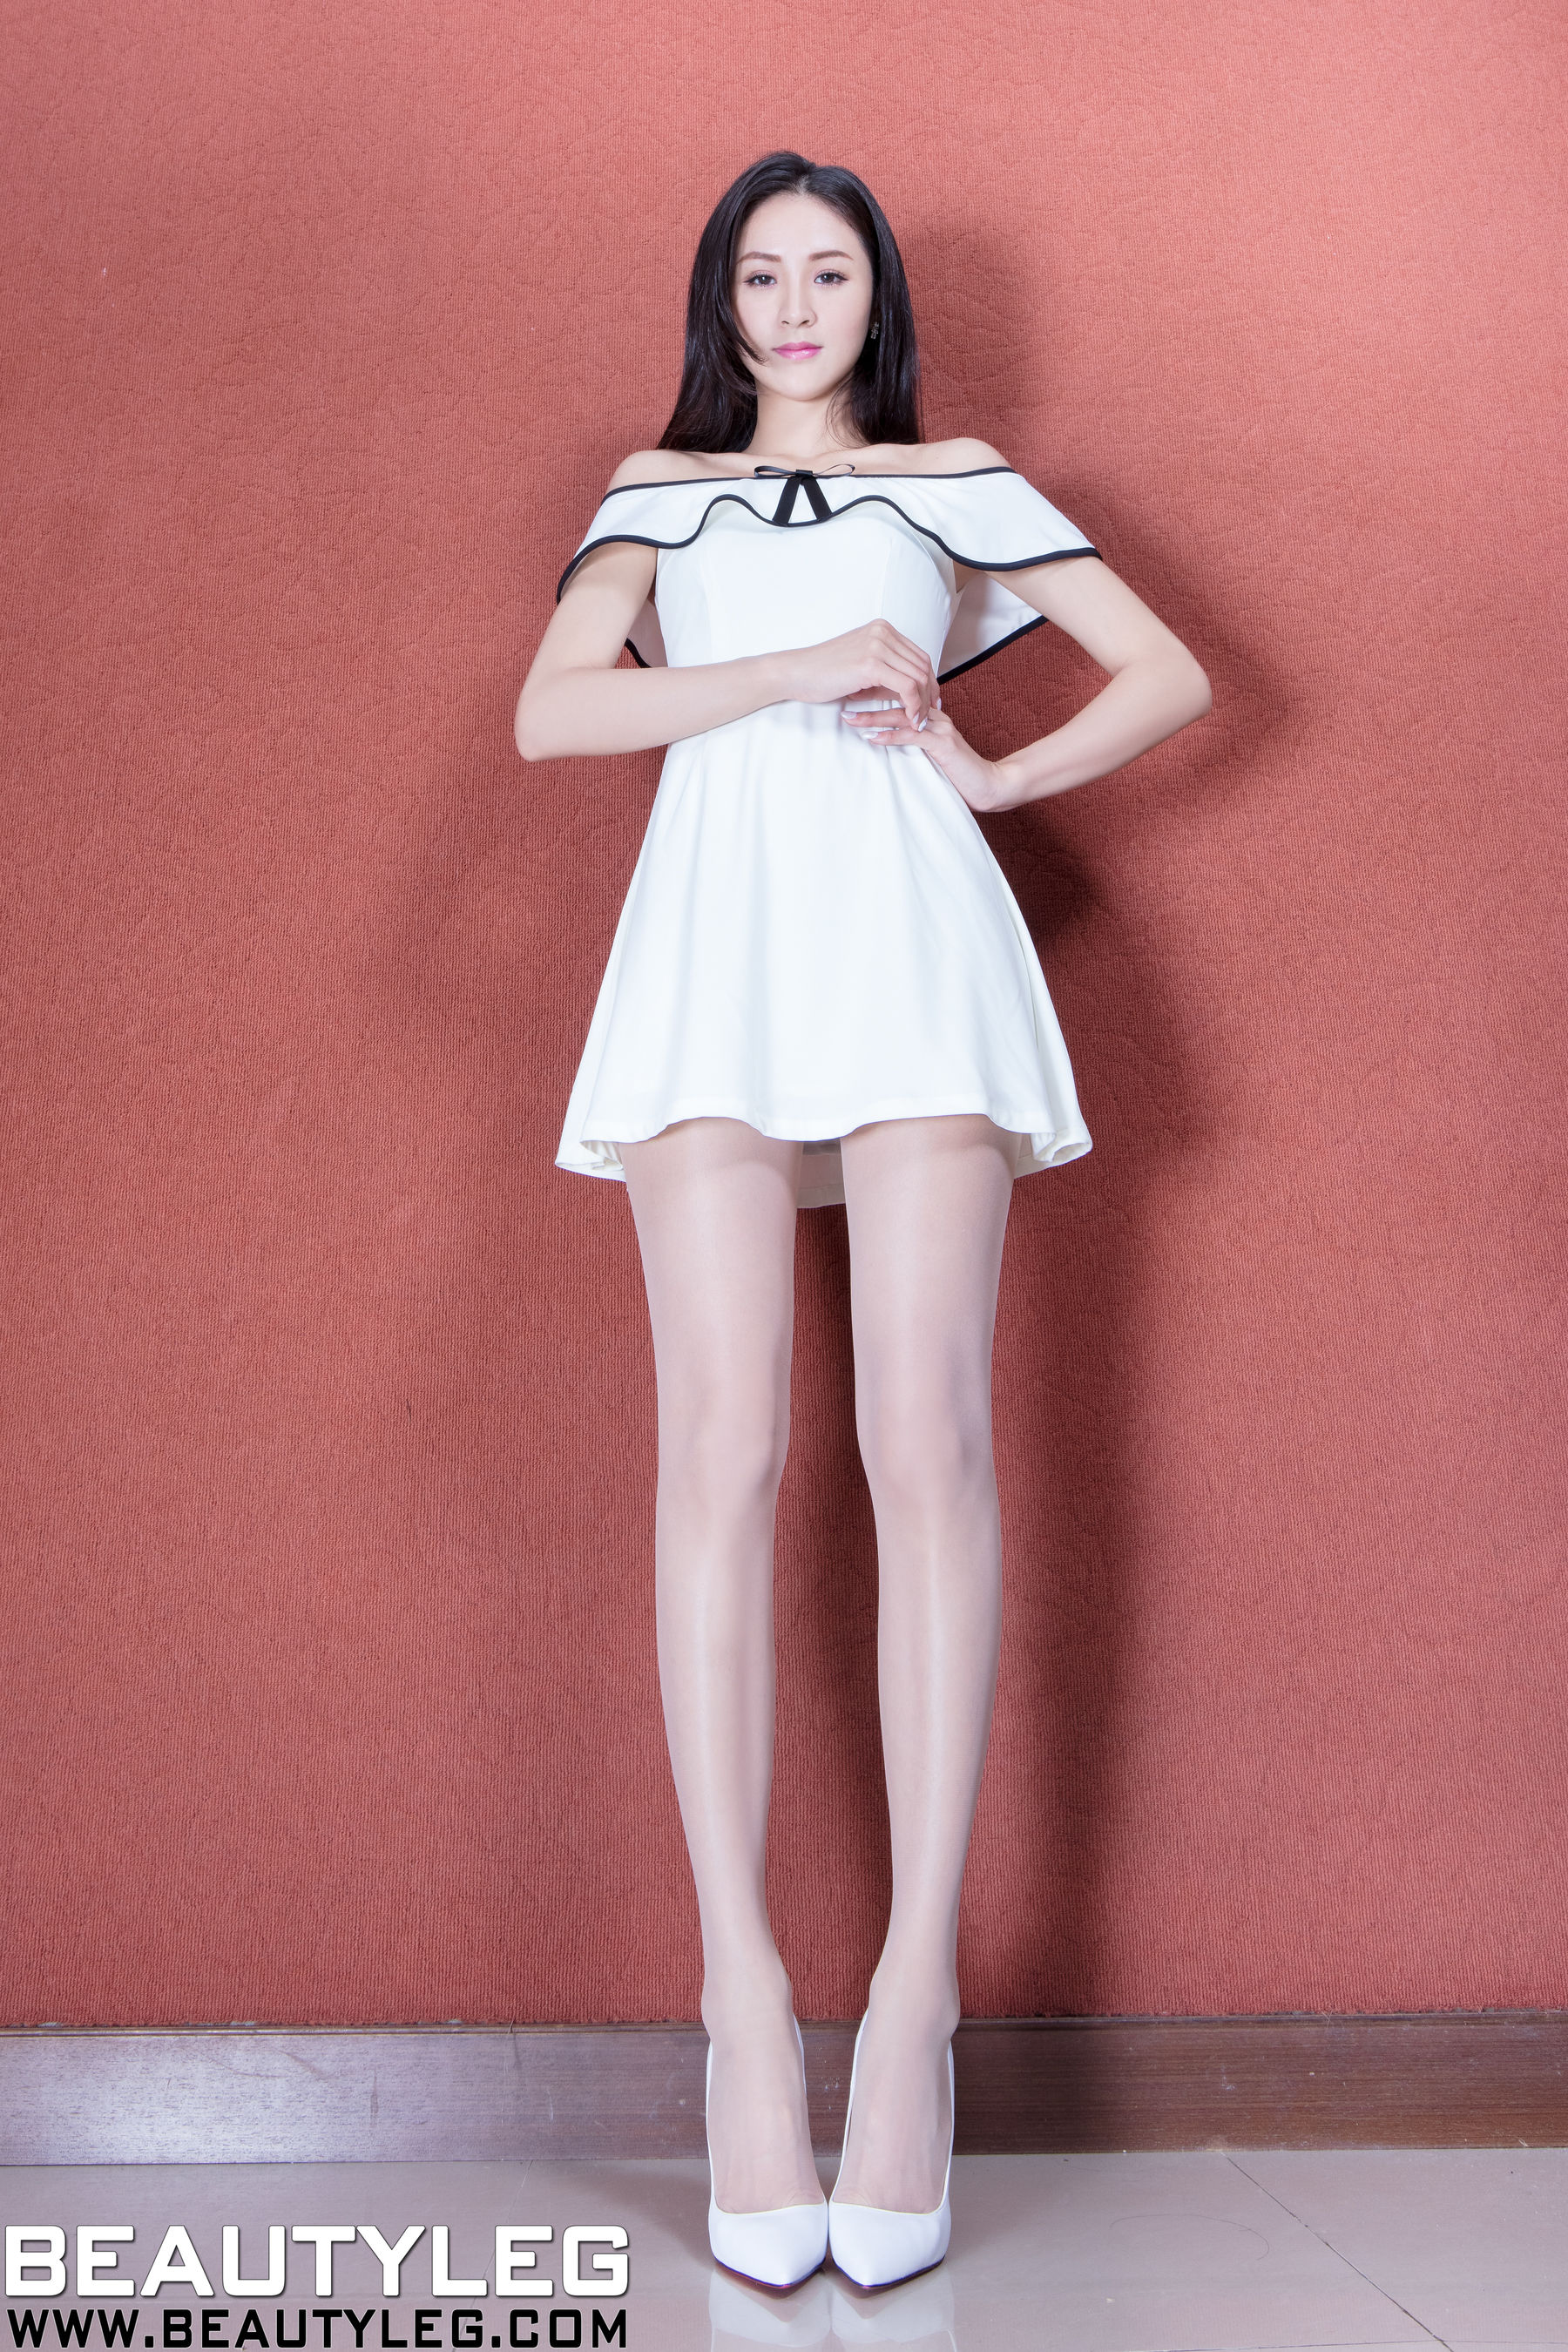 VOL.294 [Beautyleg]美腿高跟:Lola雪岑(腿模Lola)超高清个人性感漂亮大图(58P)